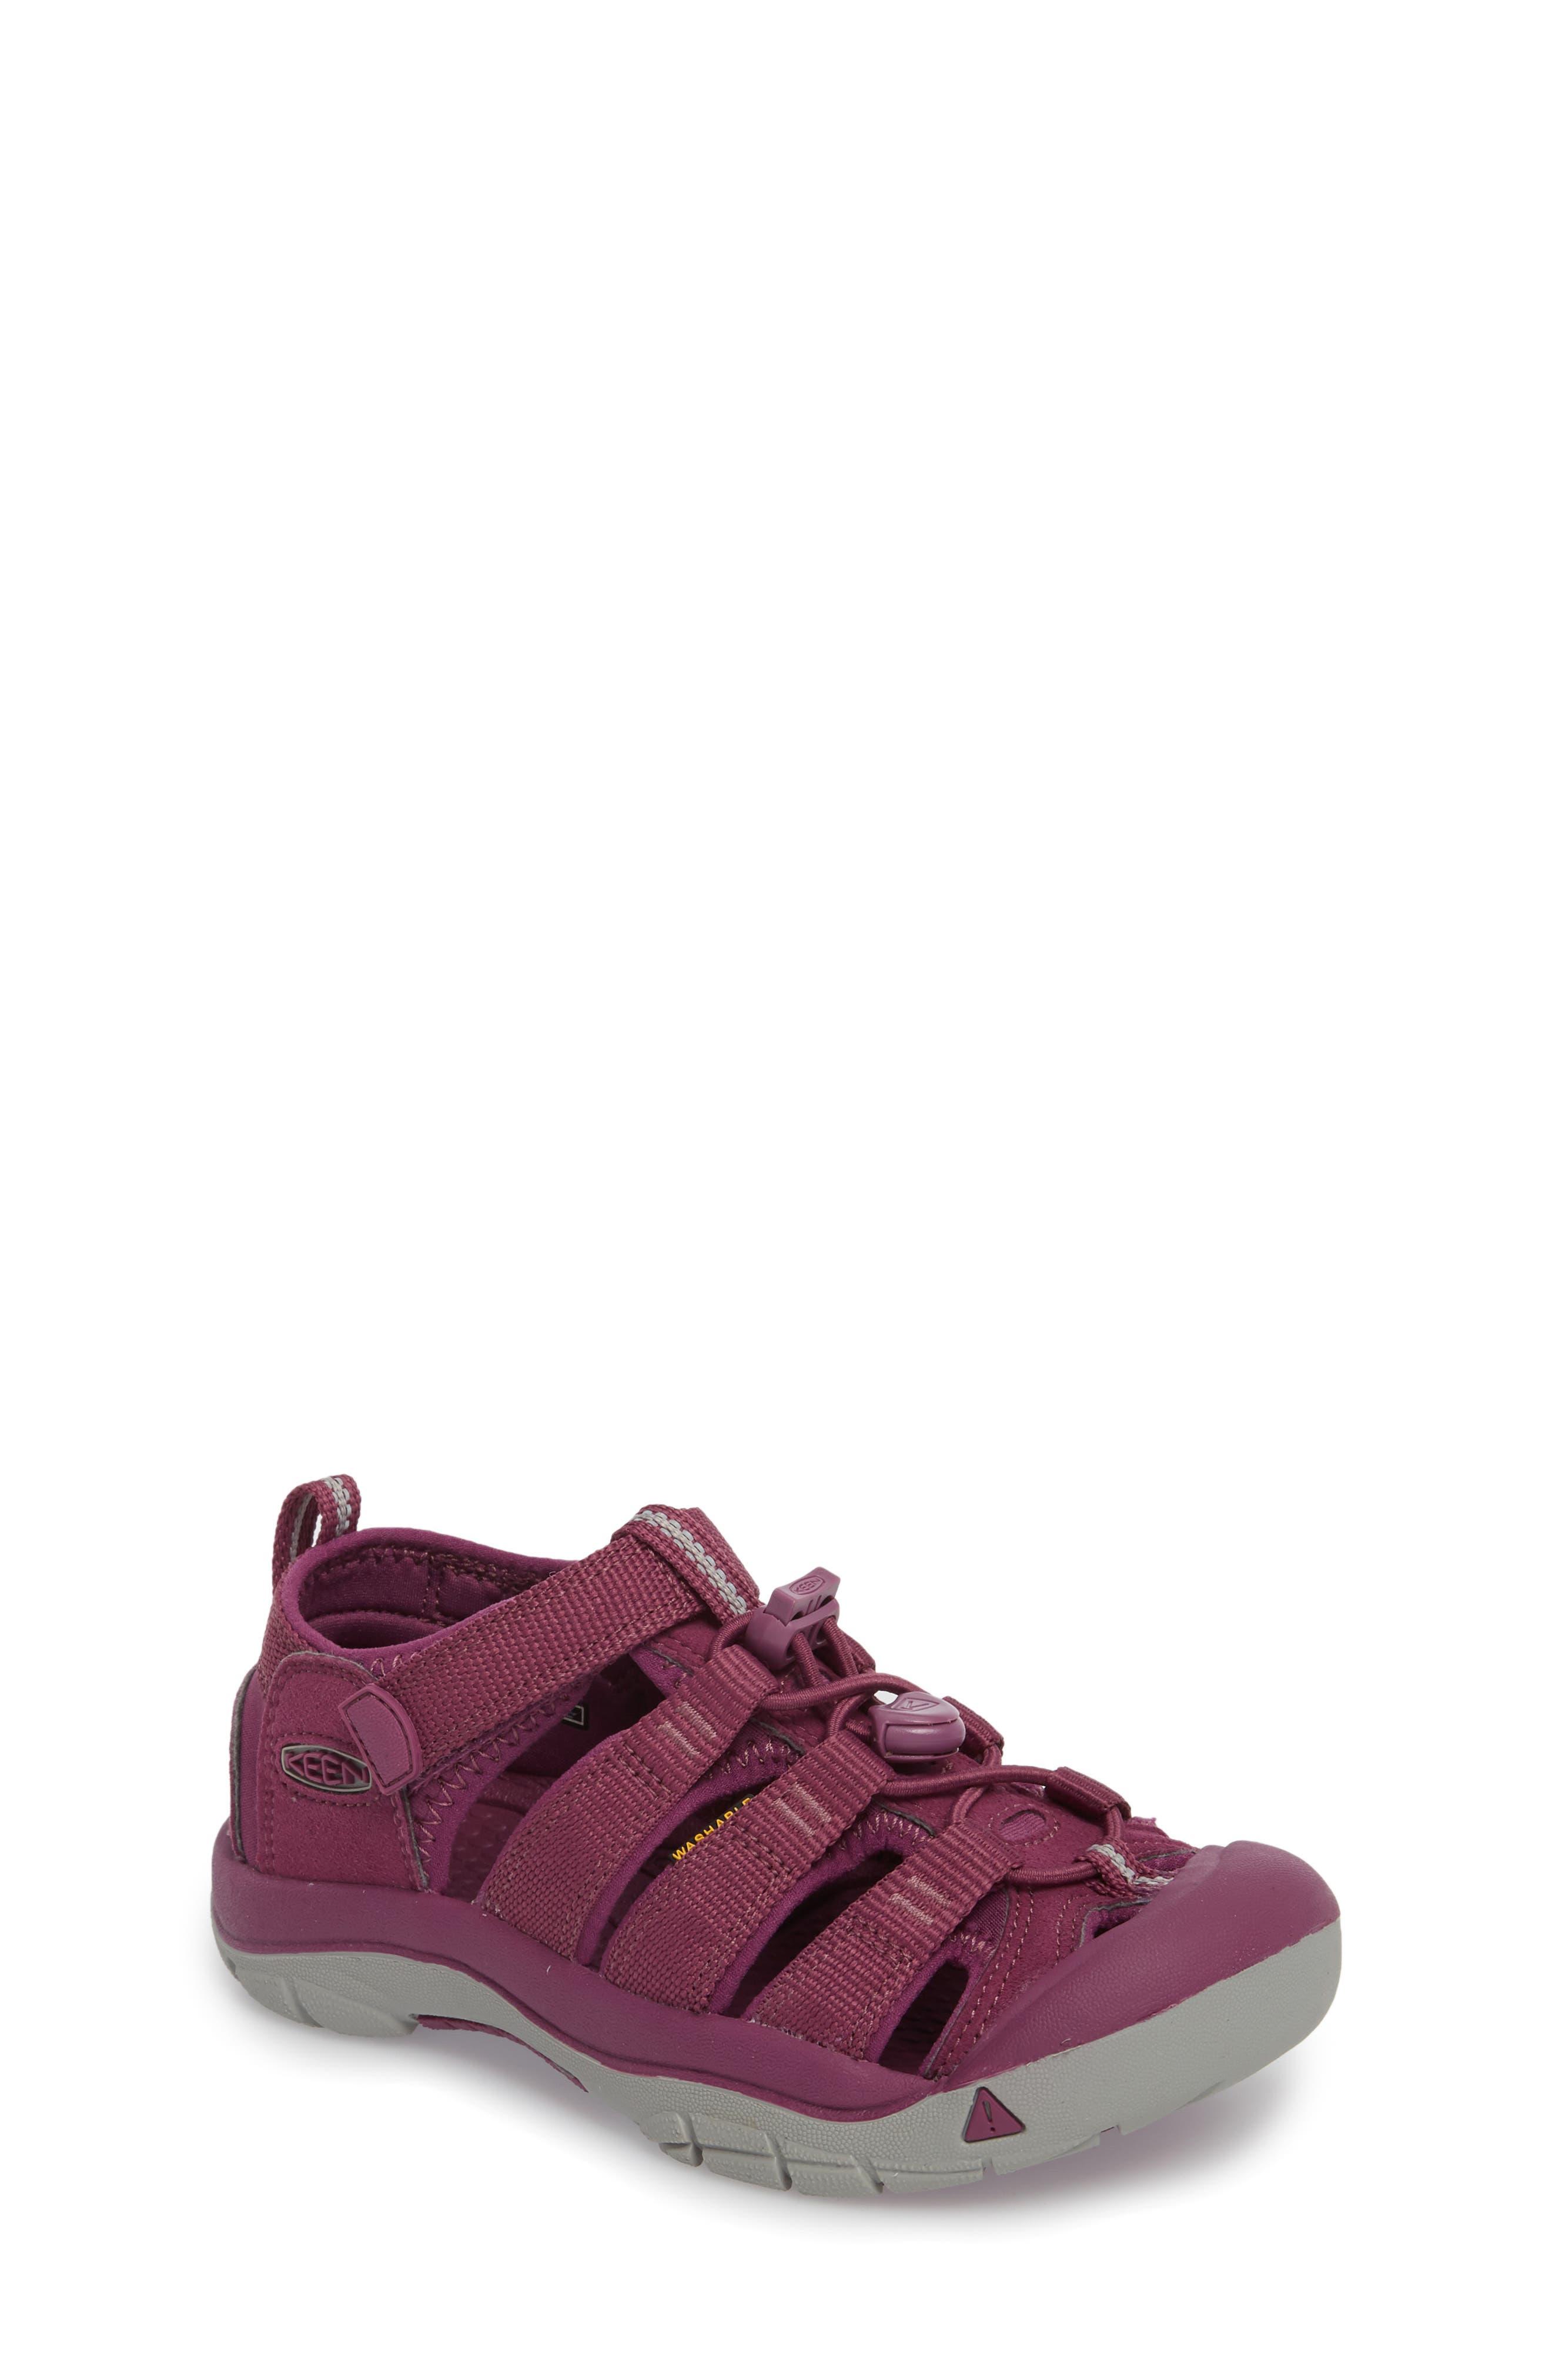 'Newport H2' Water Friendly Sandal,                             Main thumbnail 1, color,                             Grape Kiss